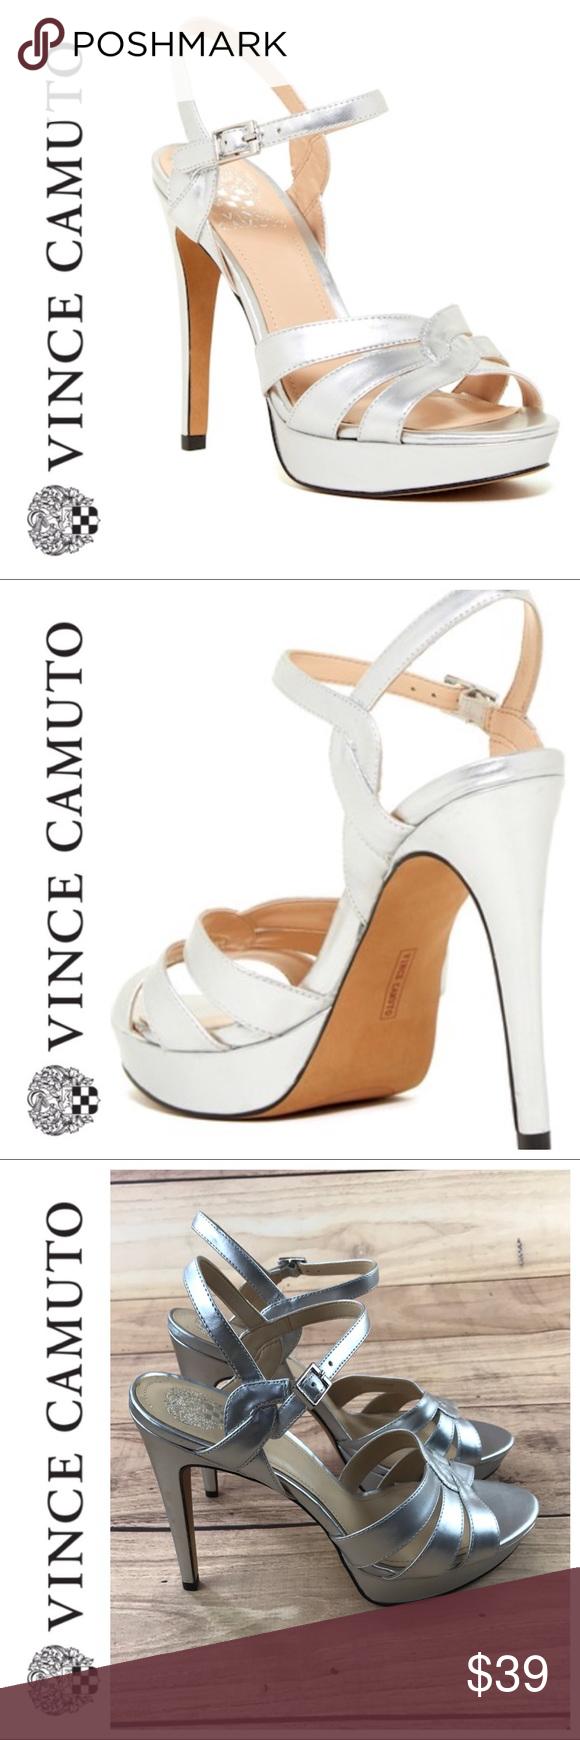 Sale Vince Camuto Silver Jillian Strappy Heels Strappy Heels Clothes Design Fashion